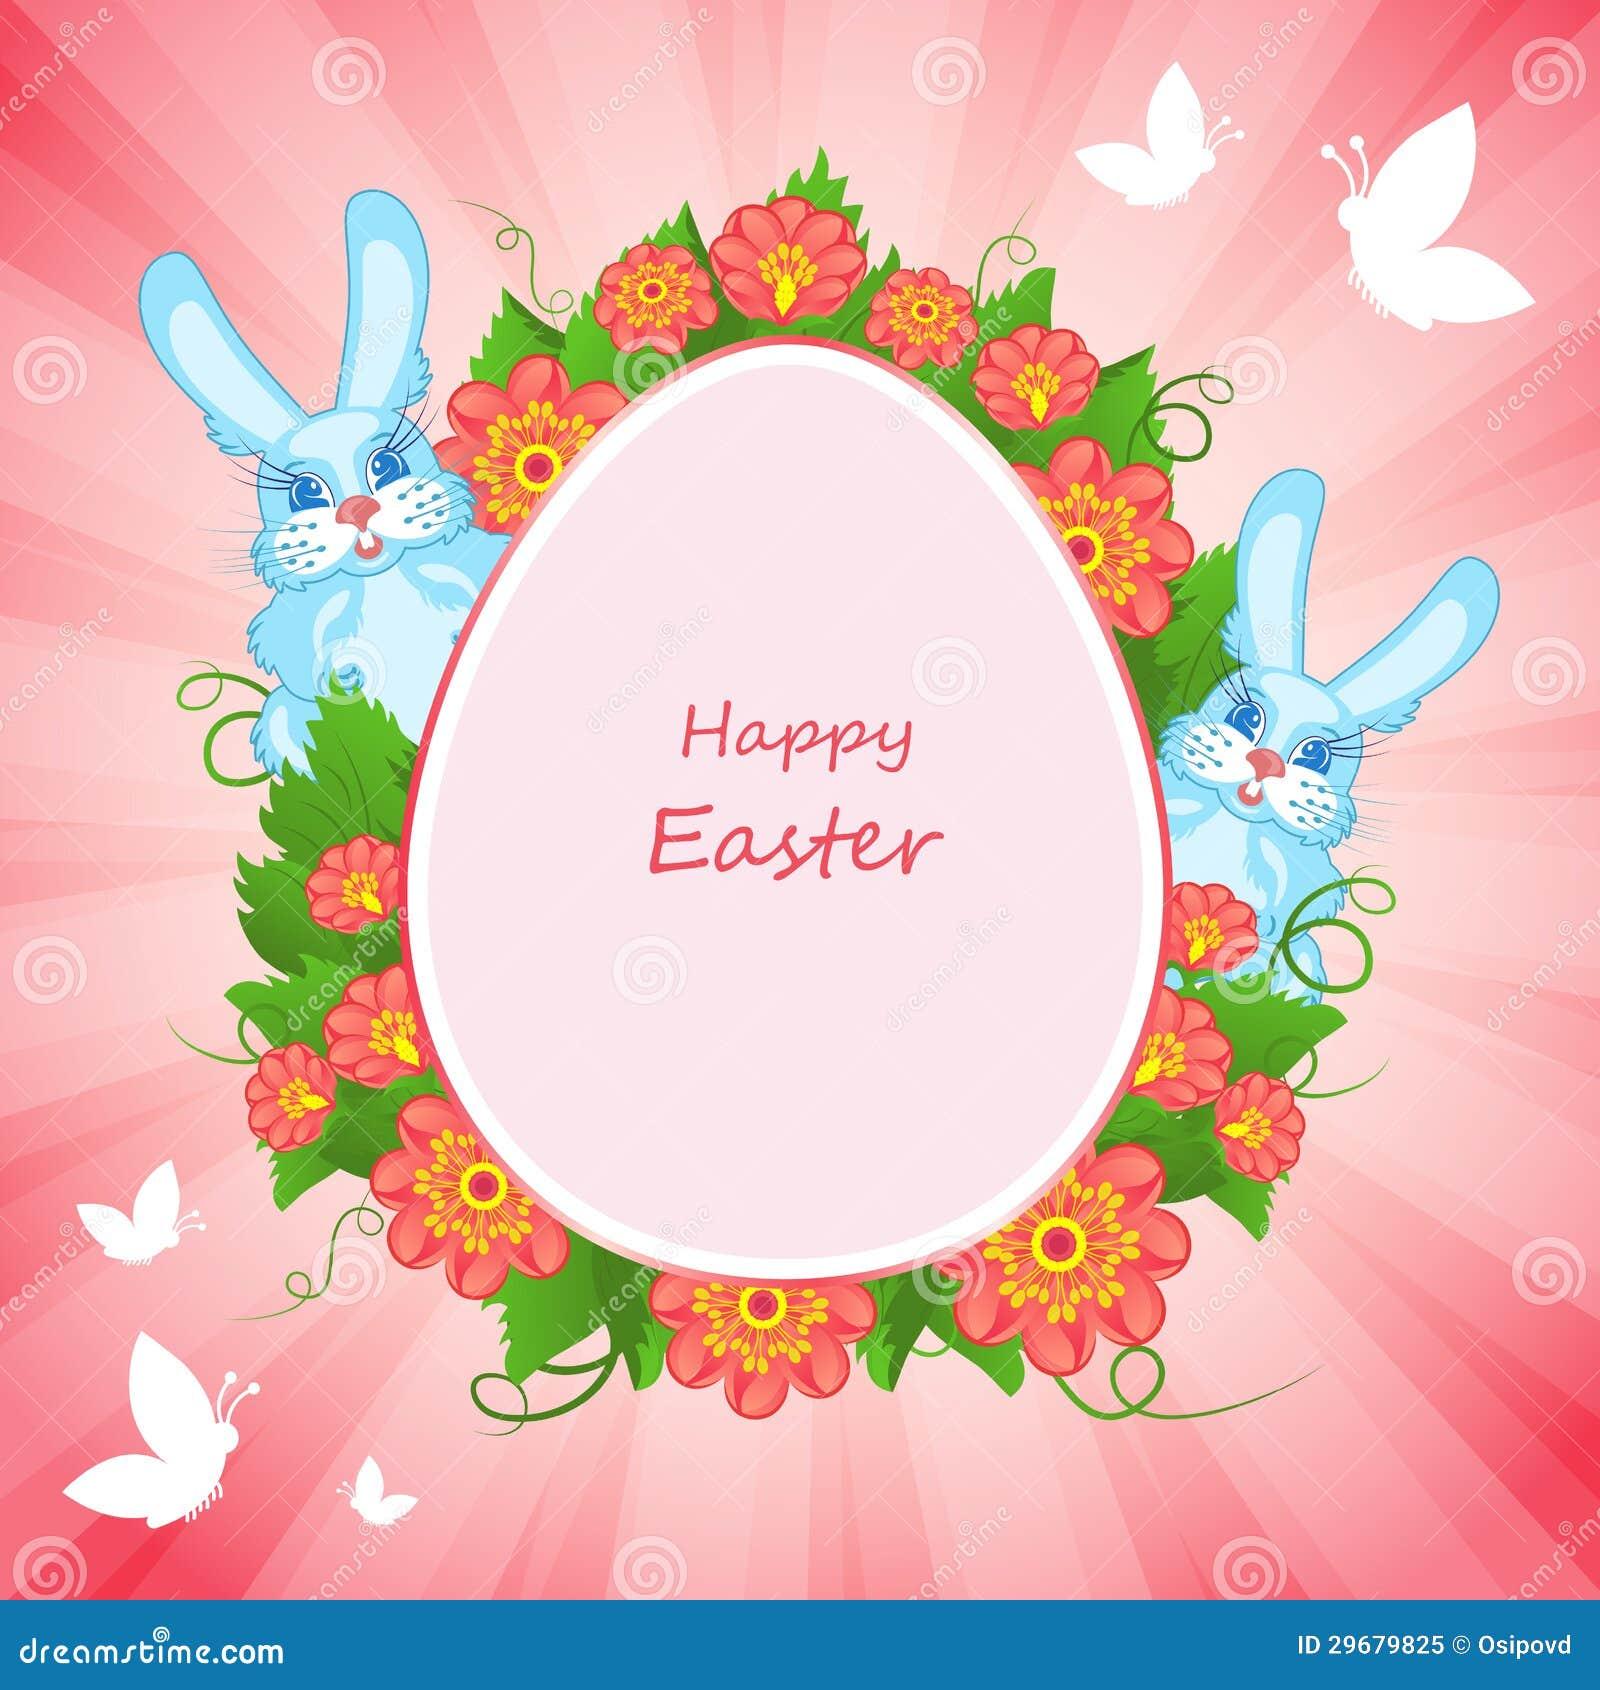 happy easter bunnies flowers-#10